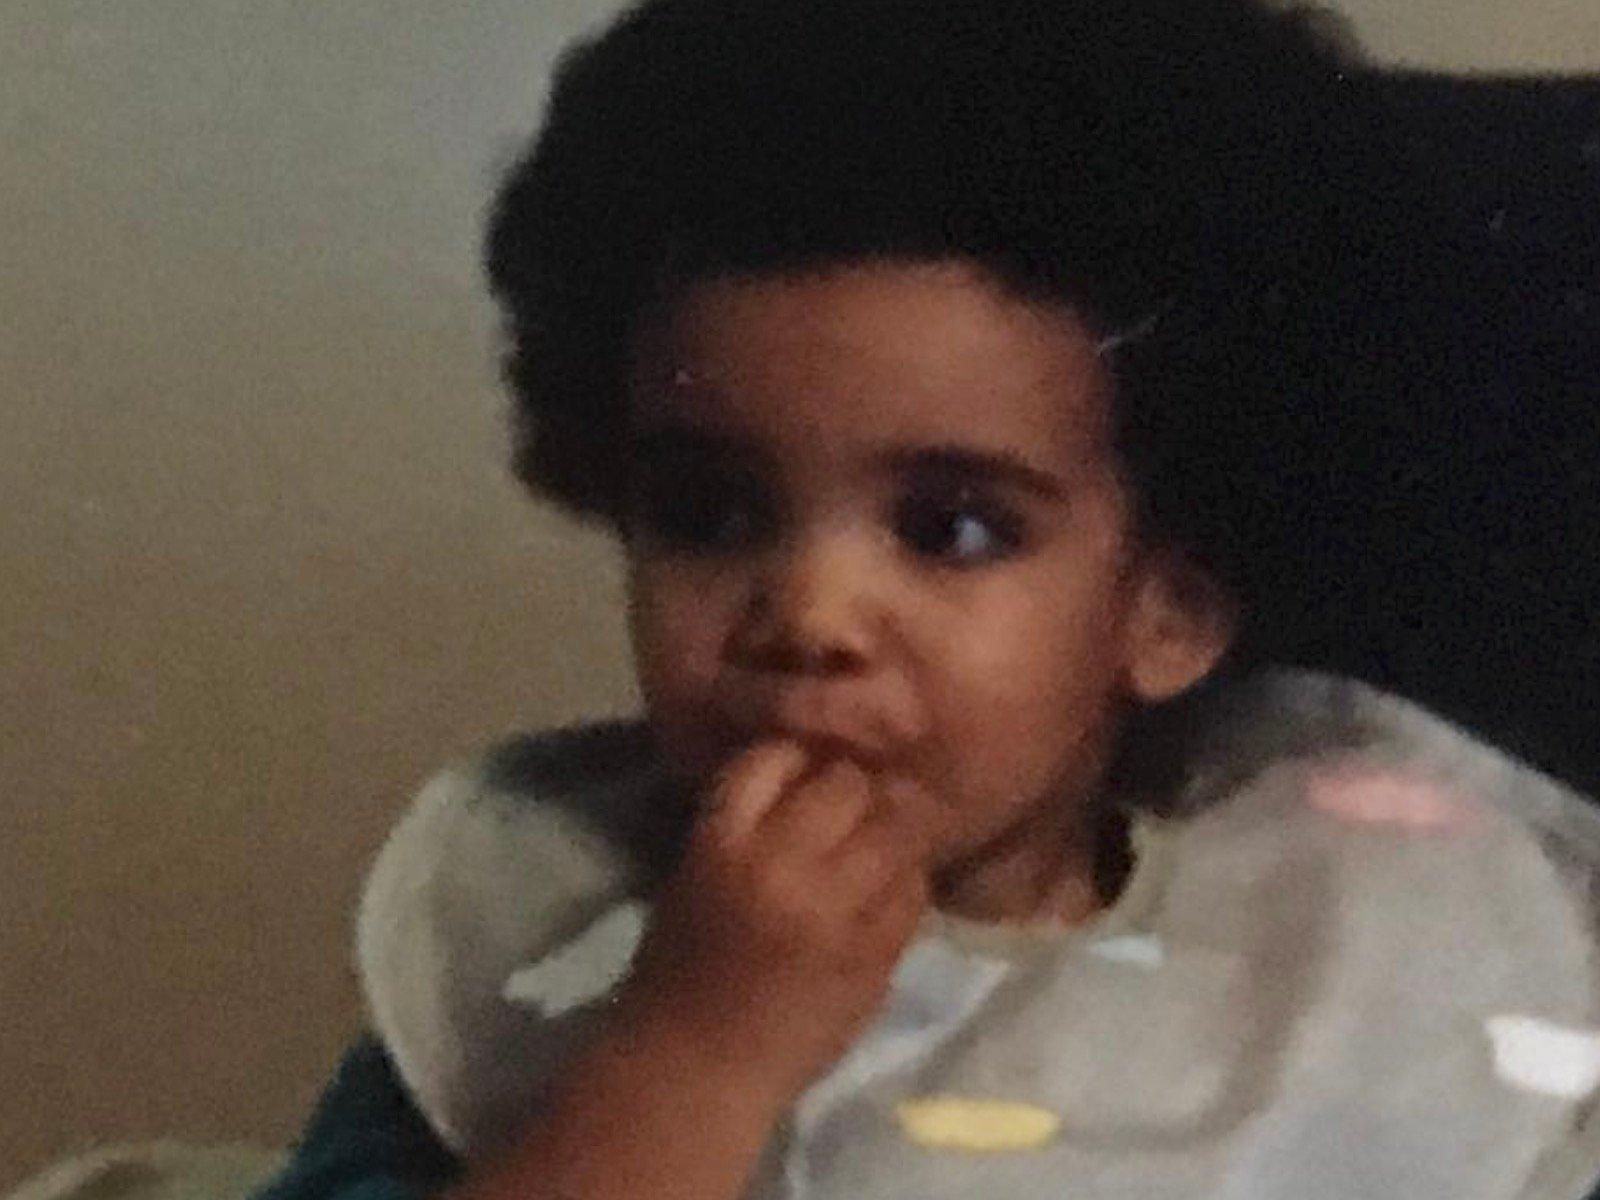 Drake Shares Vintage Pic For Throwback Thursday Me Thinking - Drake afro hairstyle